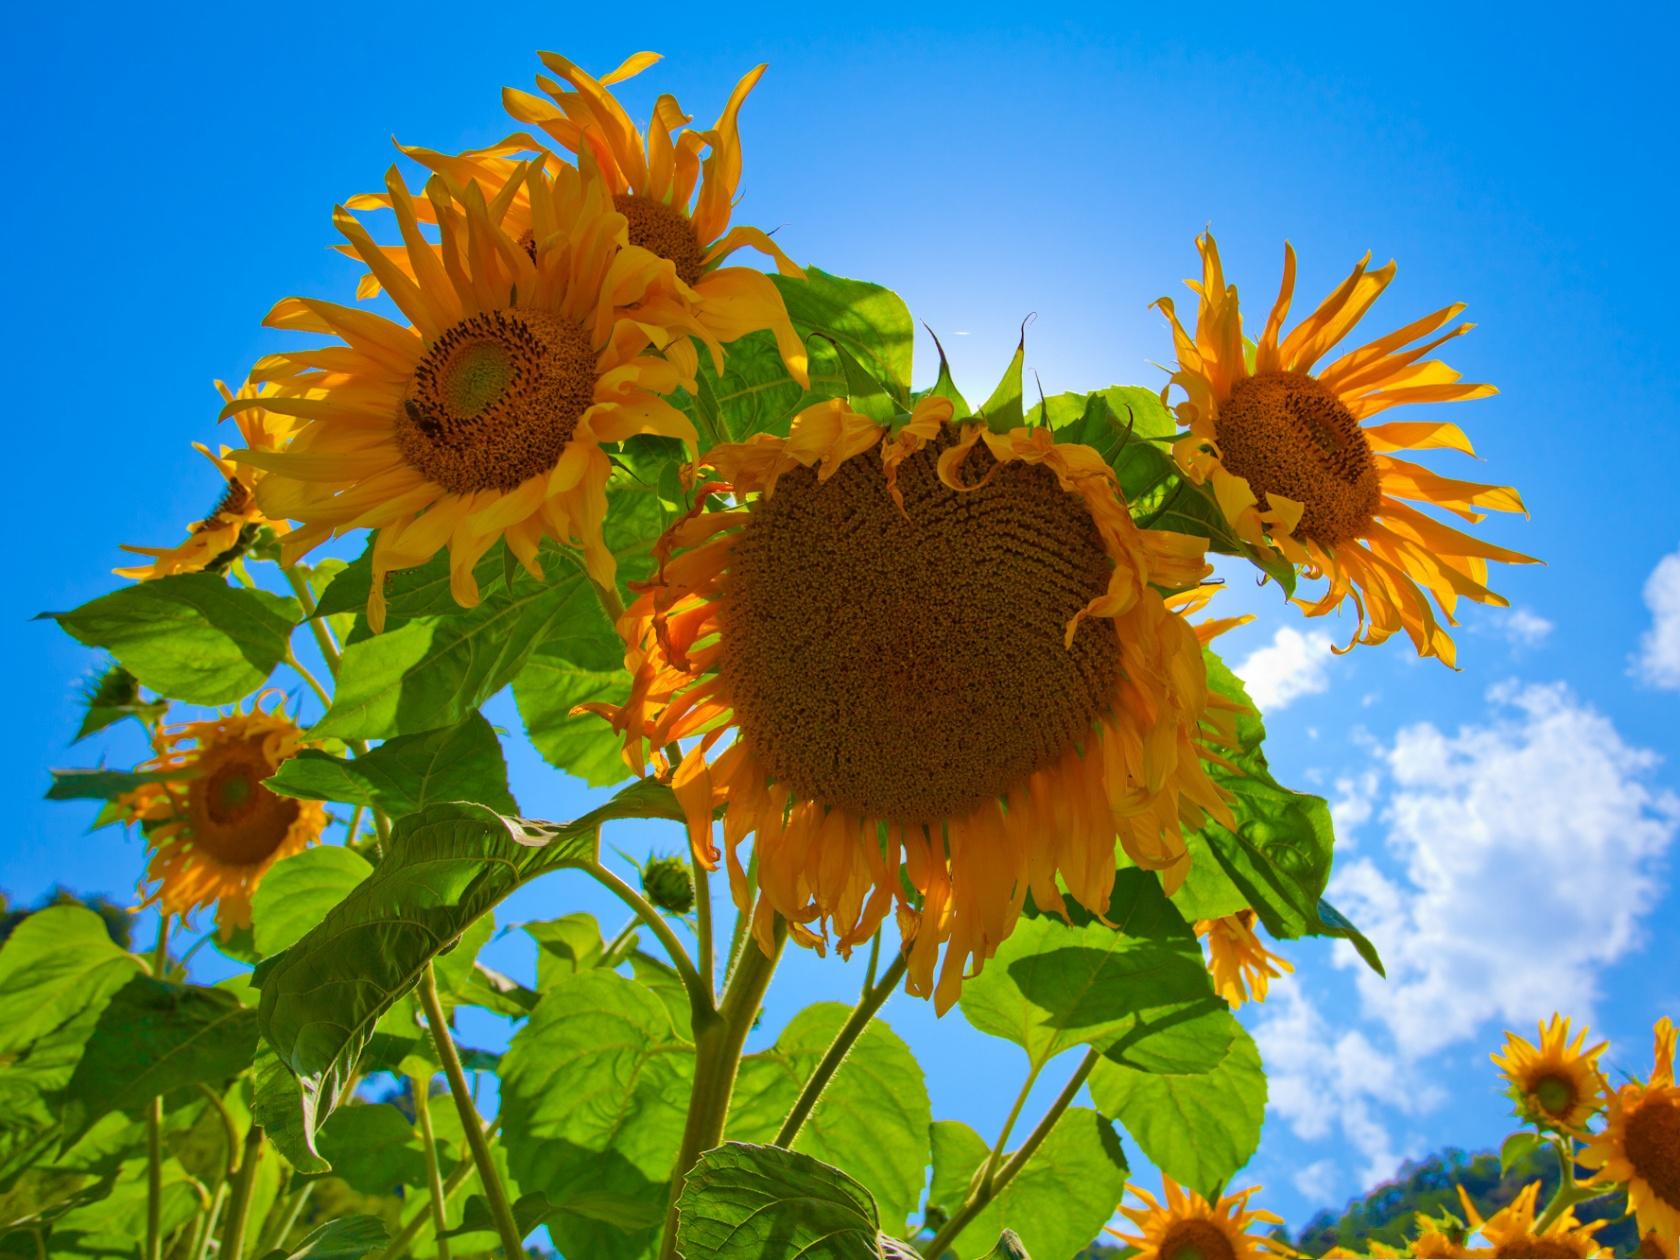 Smiling Sunflower Images Smiling Sunflowers Image